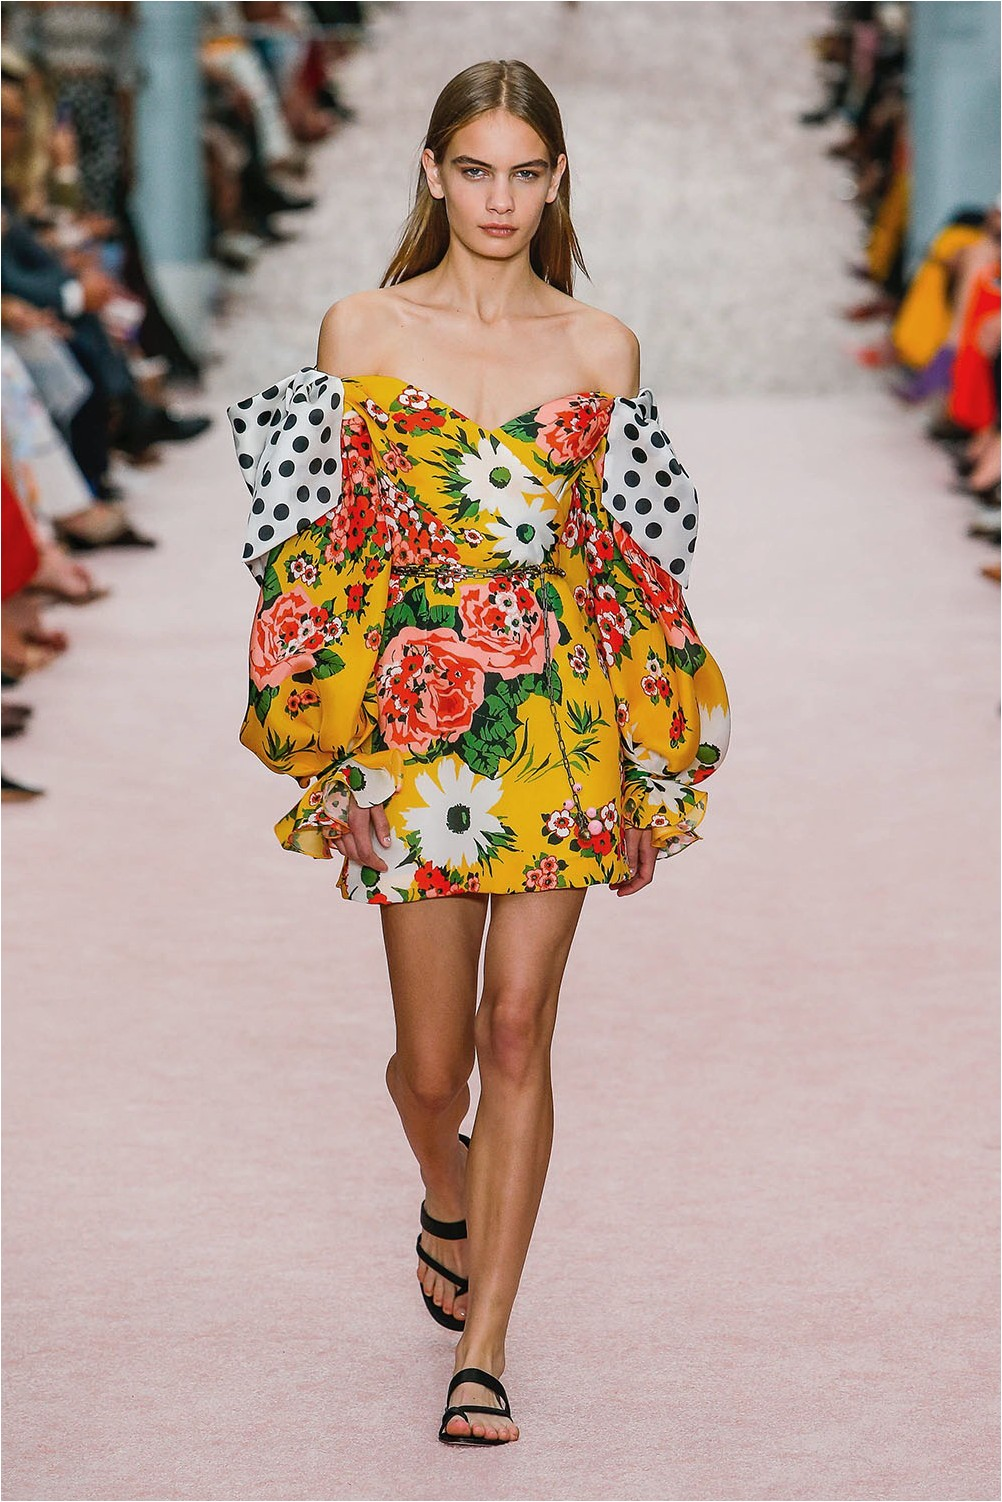 The combination of prints Carolina Herrera